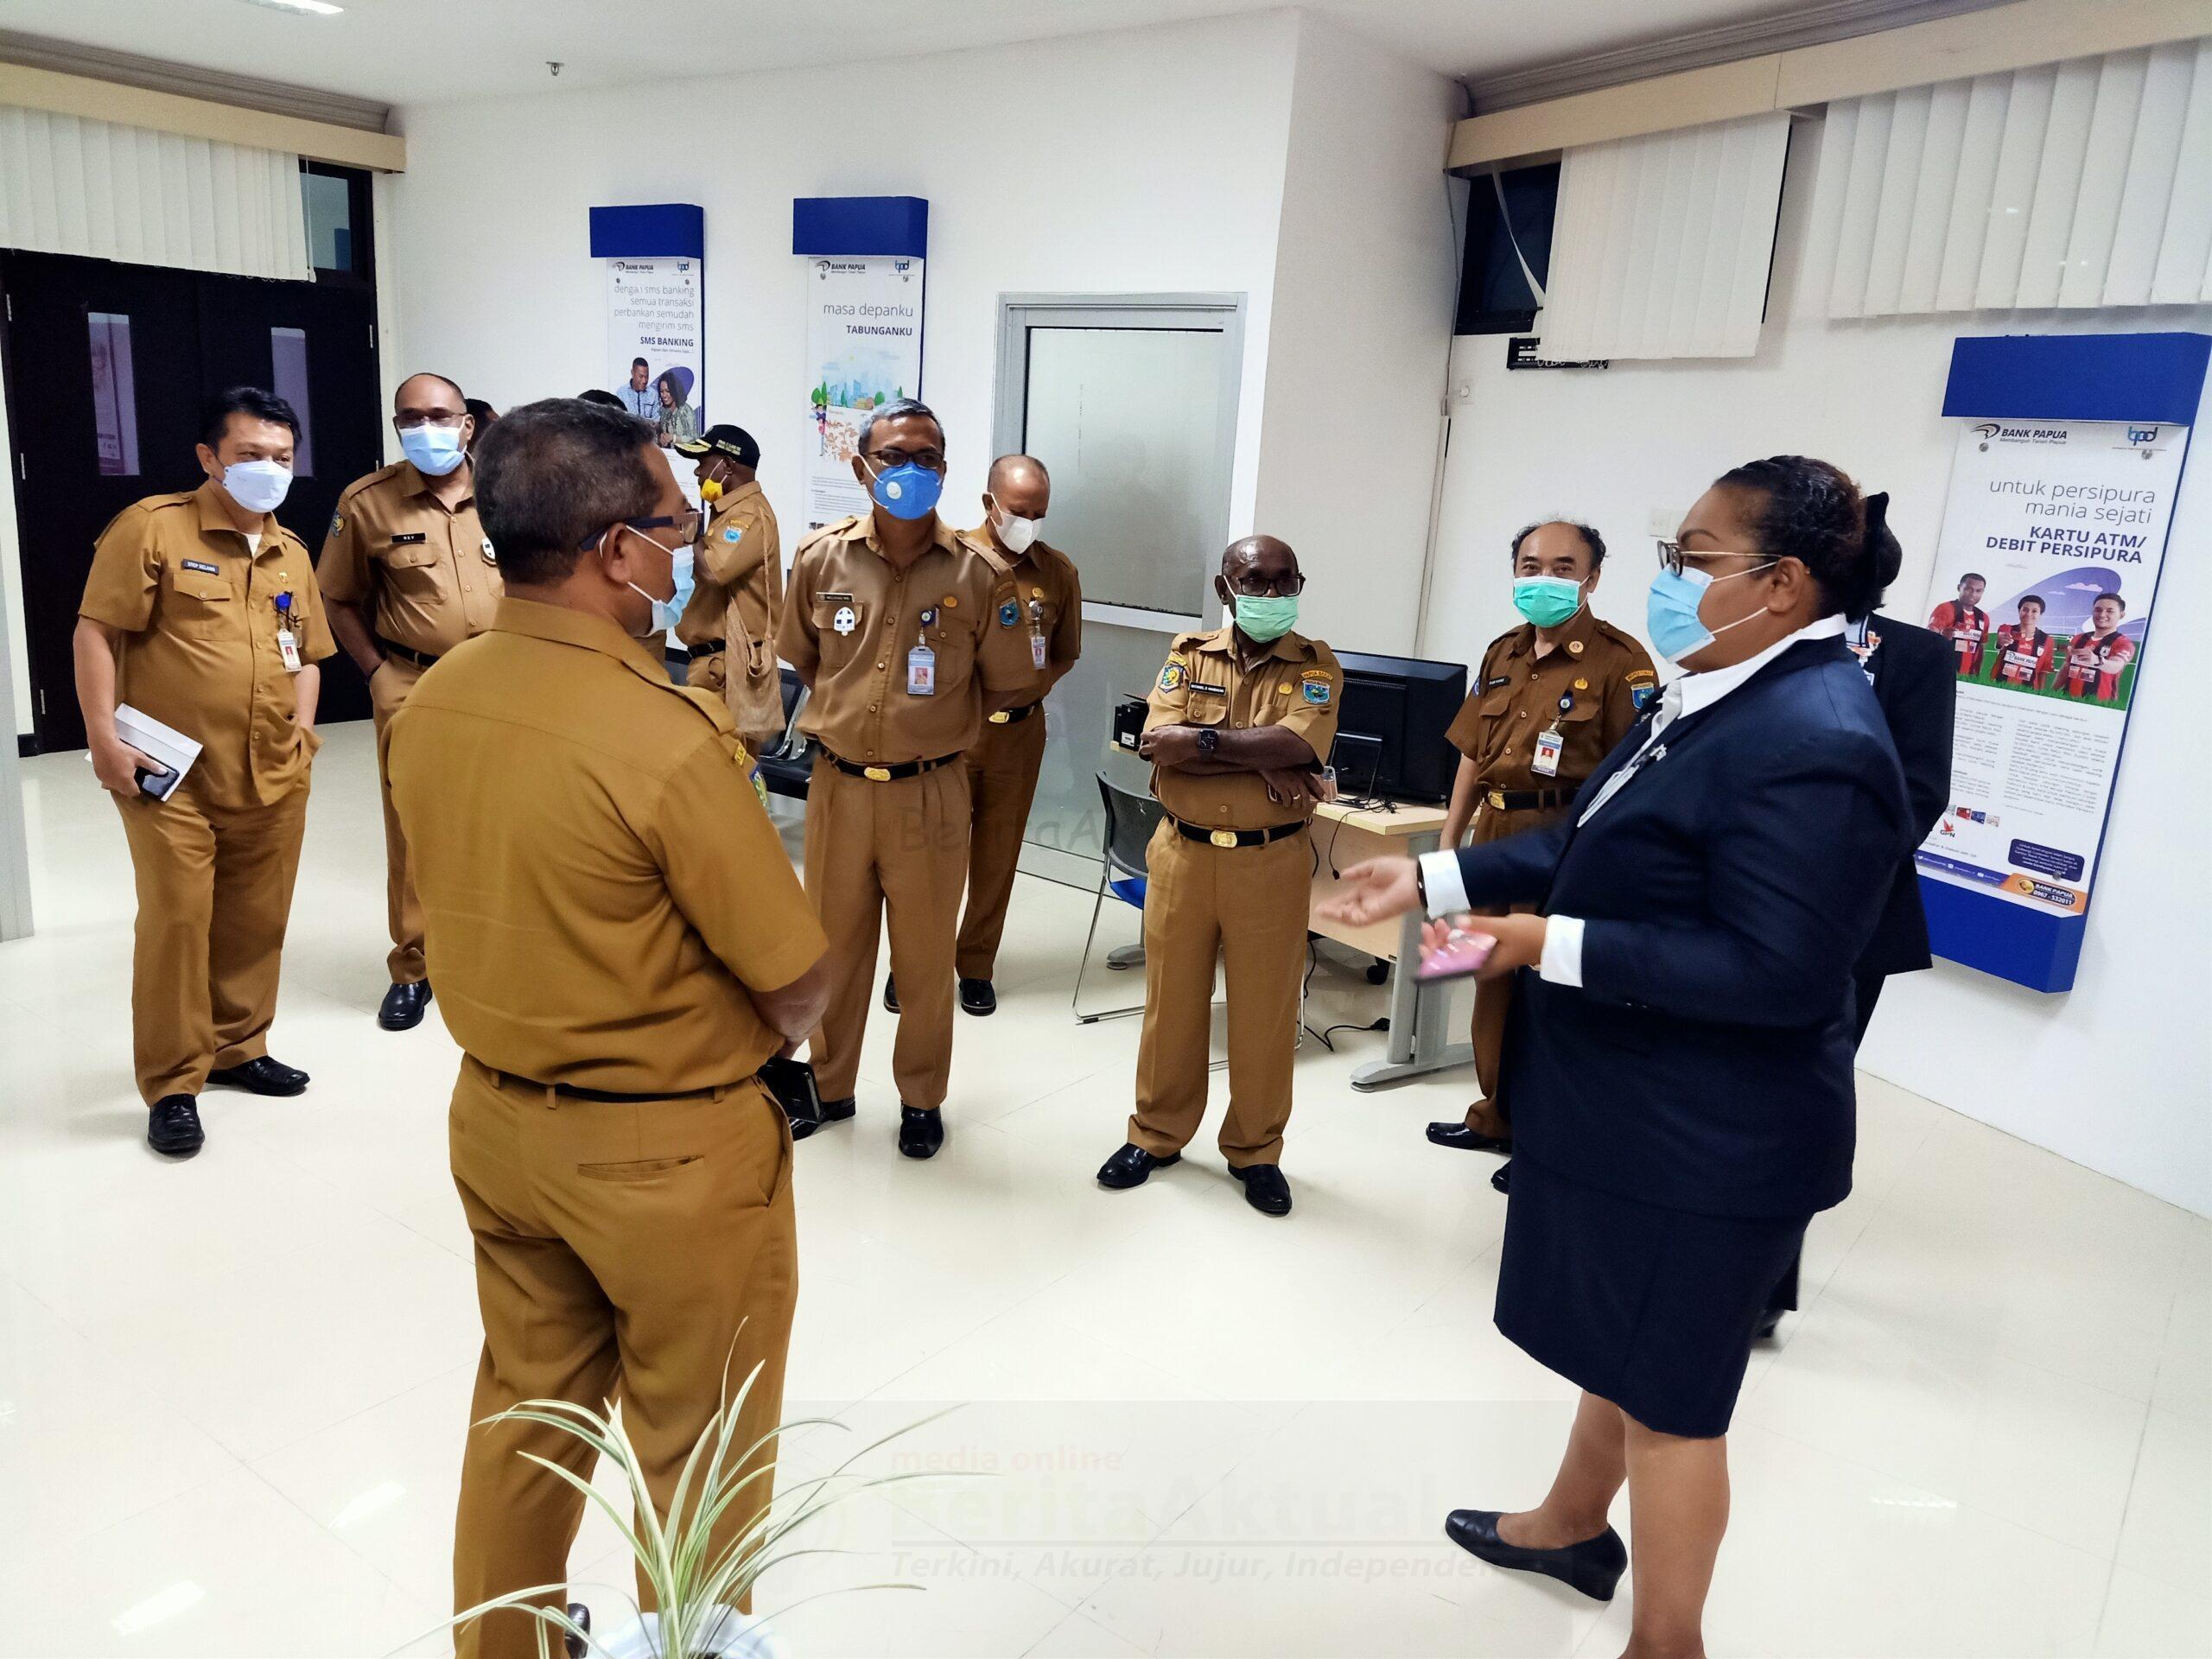 Kantor Cabang Pembantu Bank Papua Kini Resmi Beroperasi di Kantor Gubernur Arfai 16 IMG20210111112042 scaled